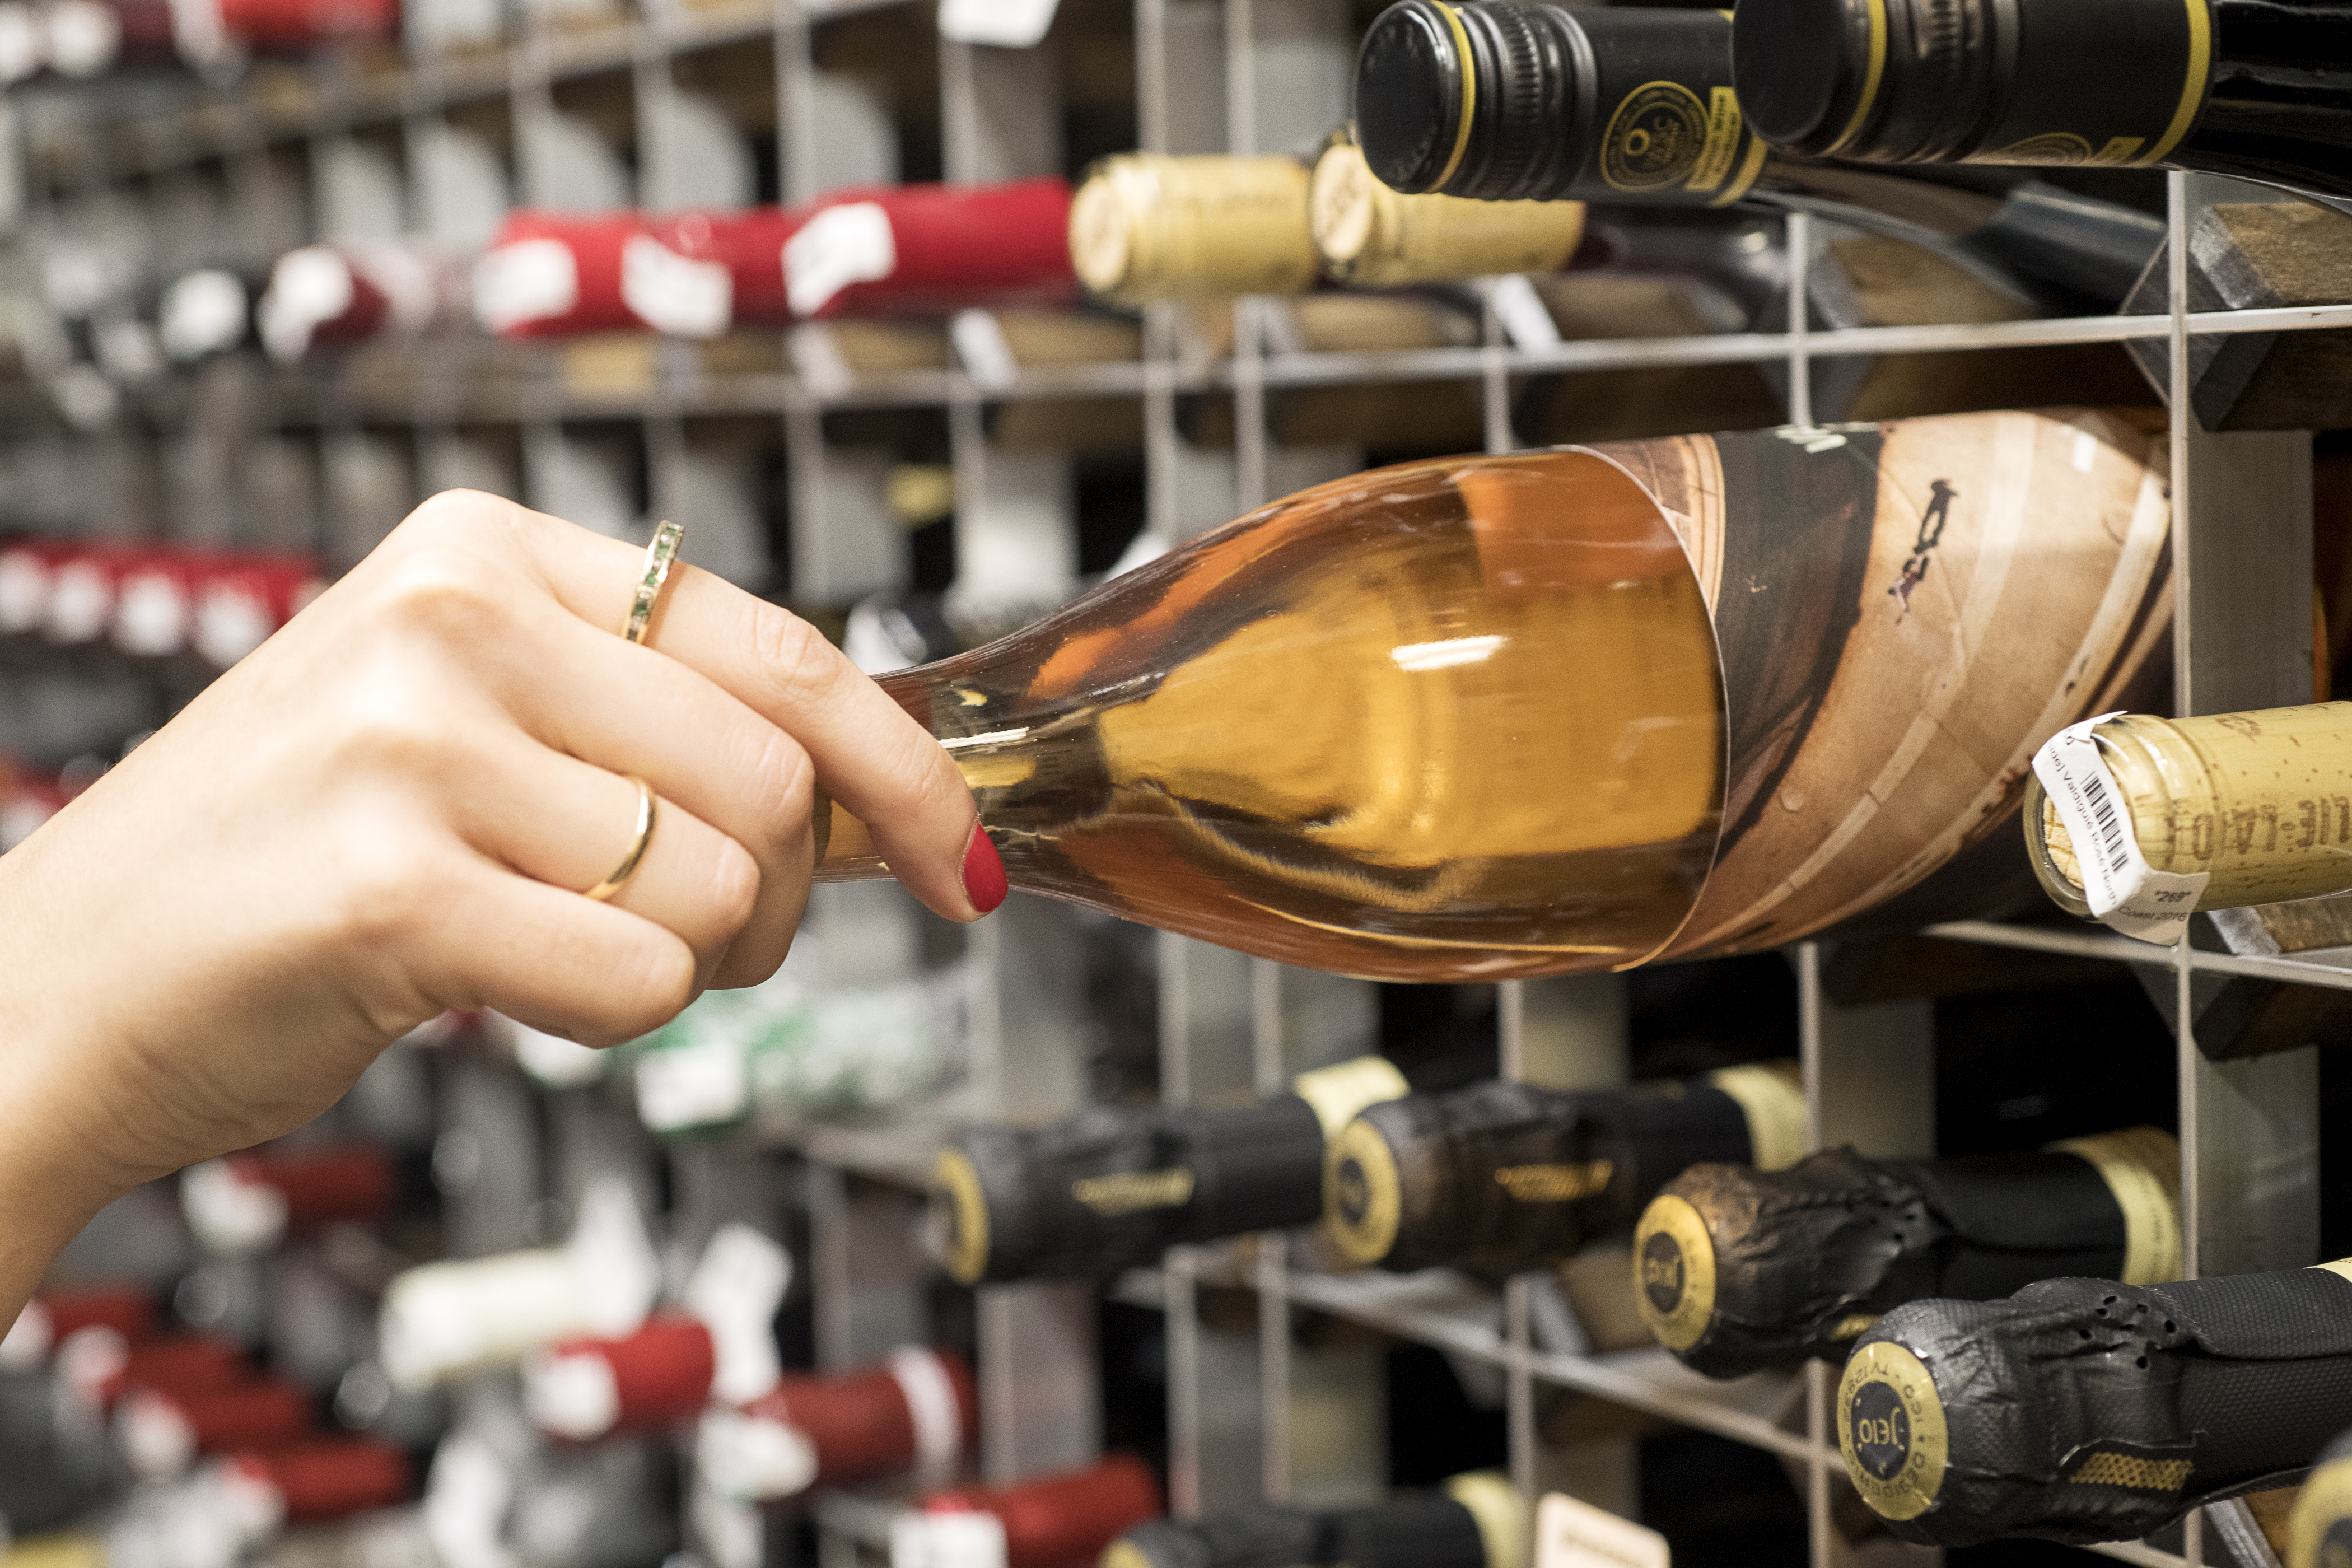 Kourtney Kardashian's Organic Wine Recommendations Are Surprisingly Good